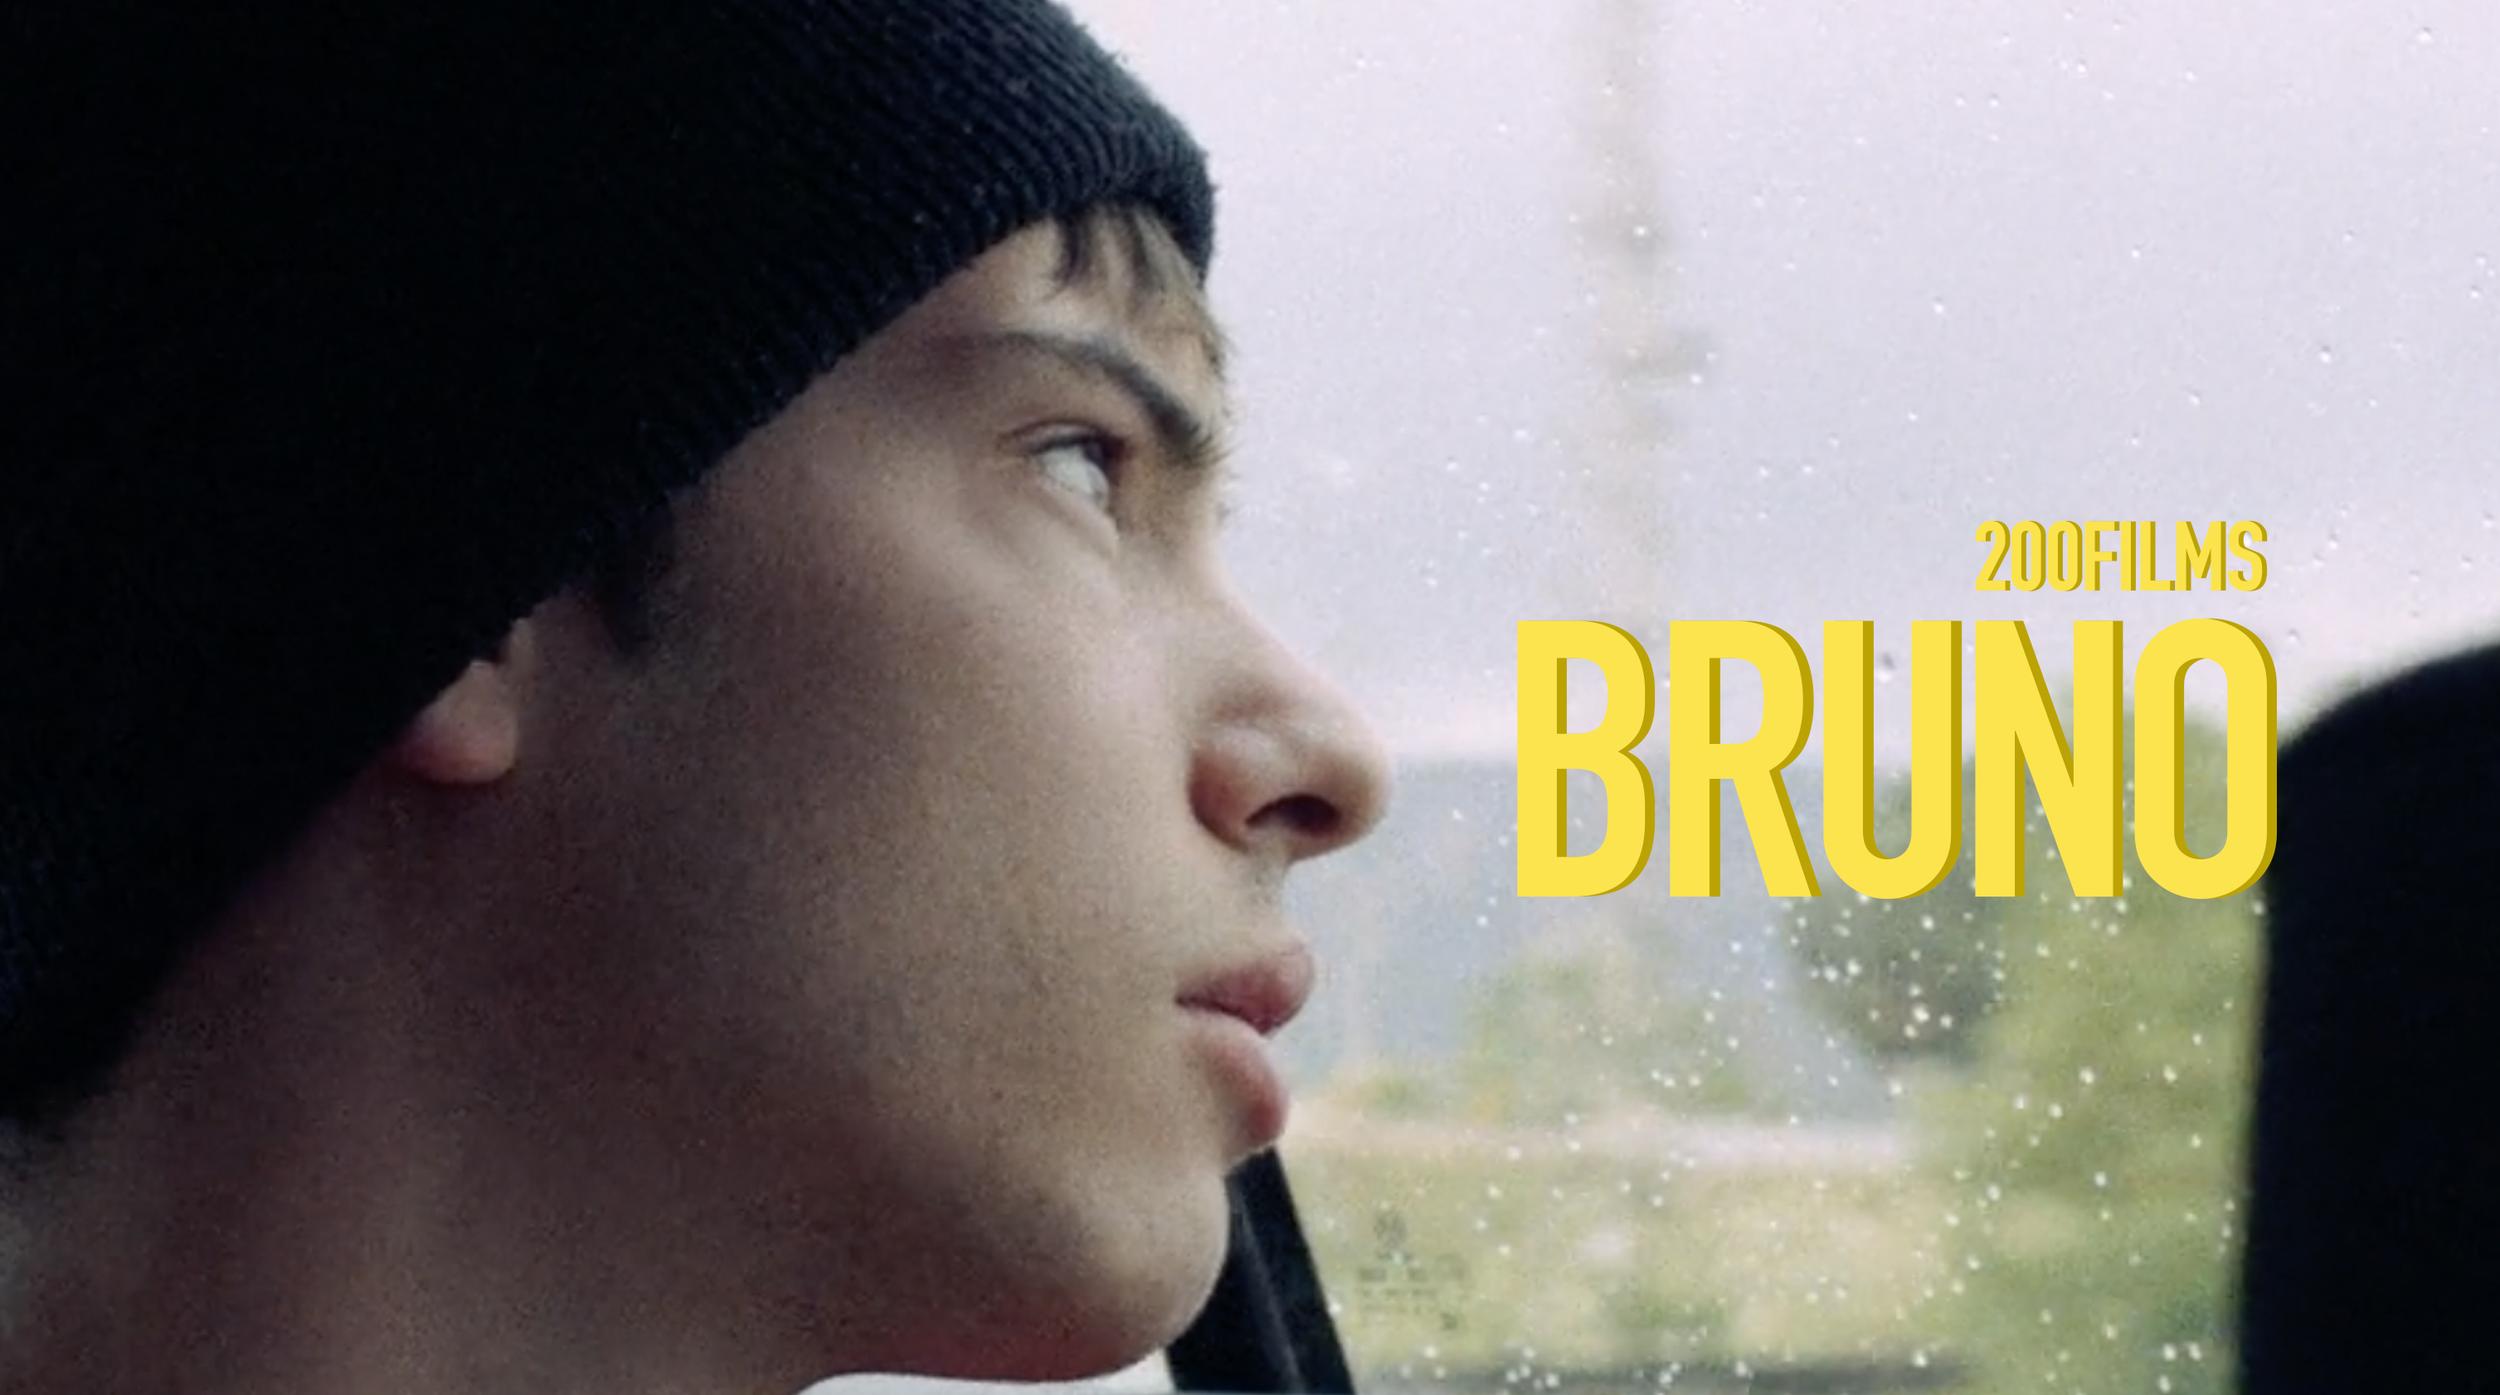 bruno.png